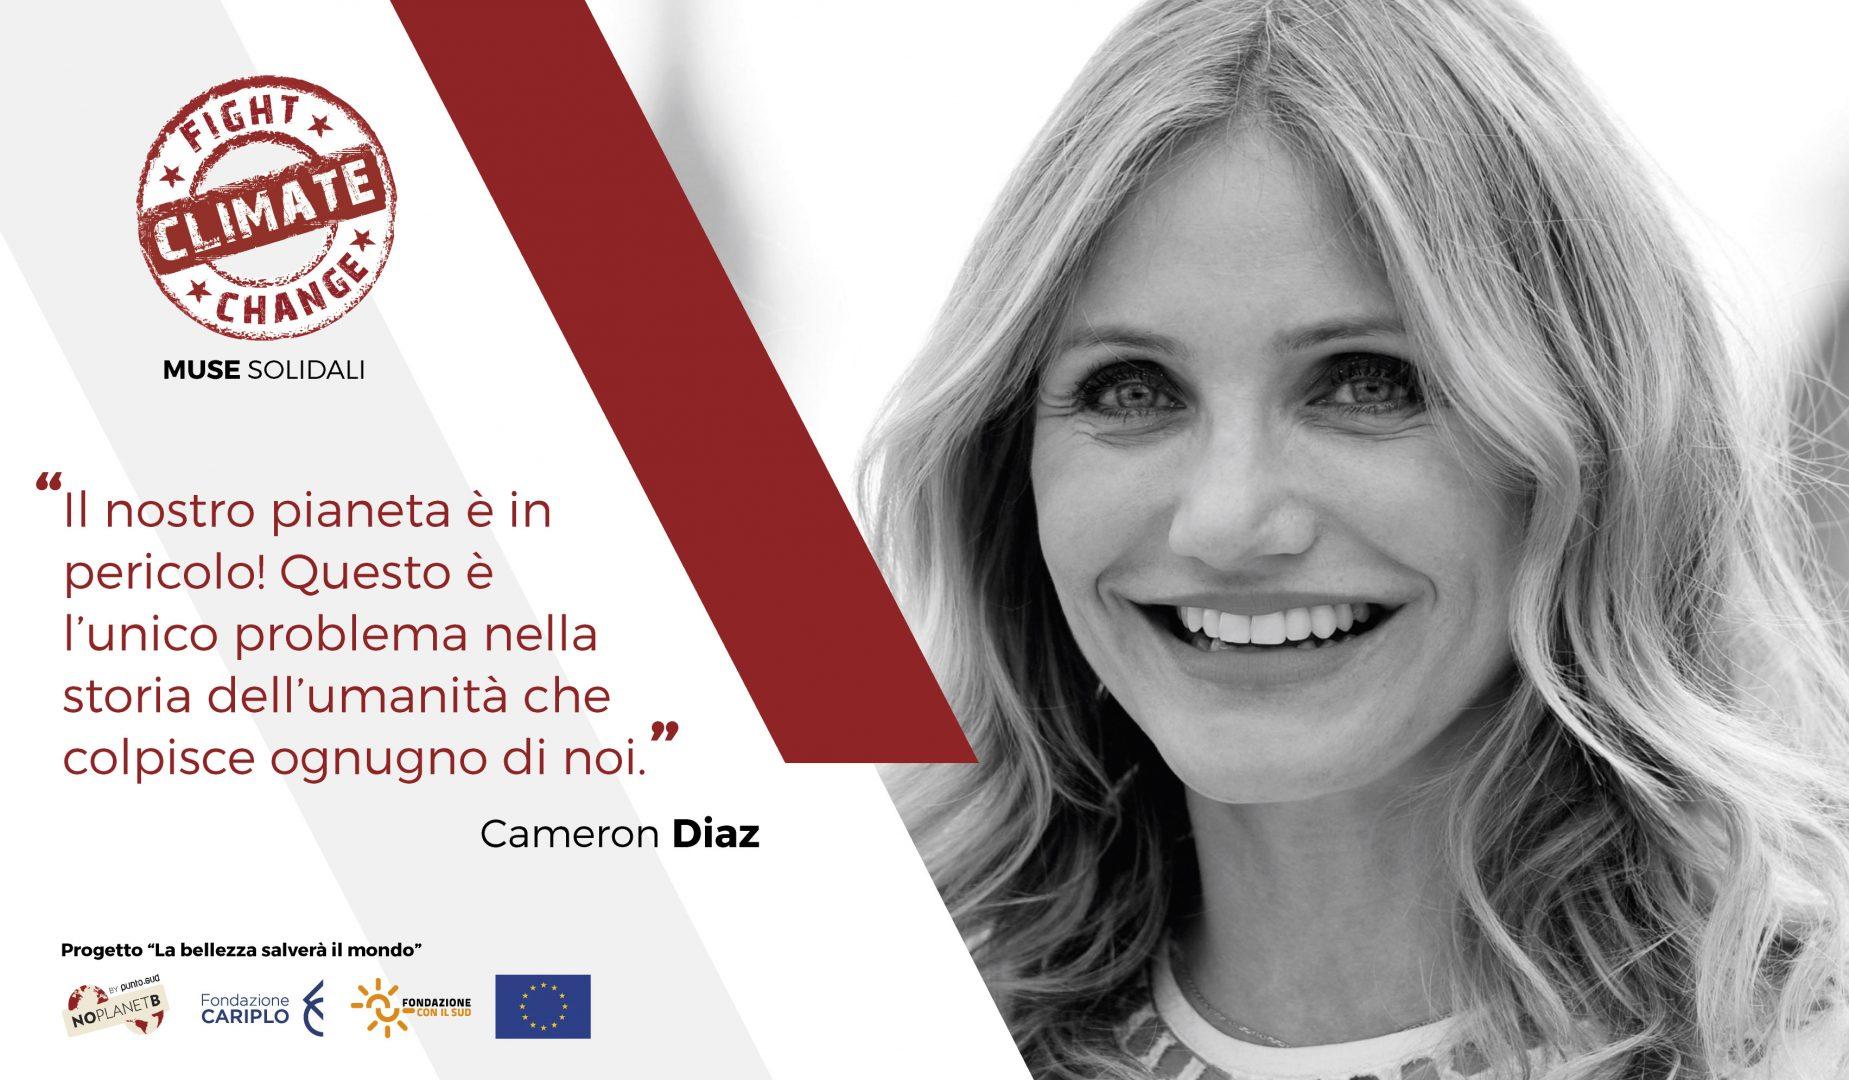 Cameron-Diaz-pannello-120x70